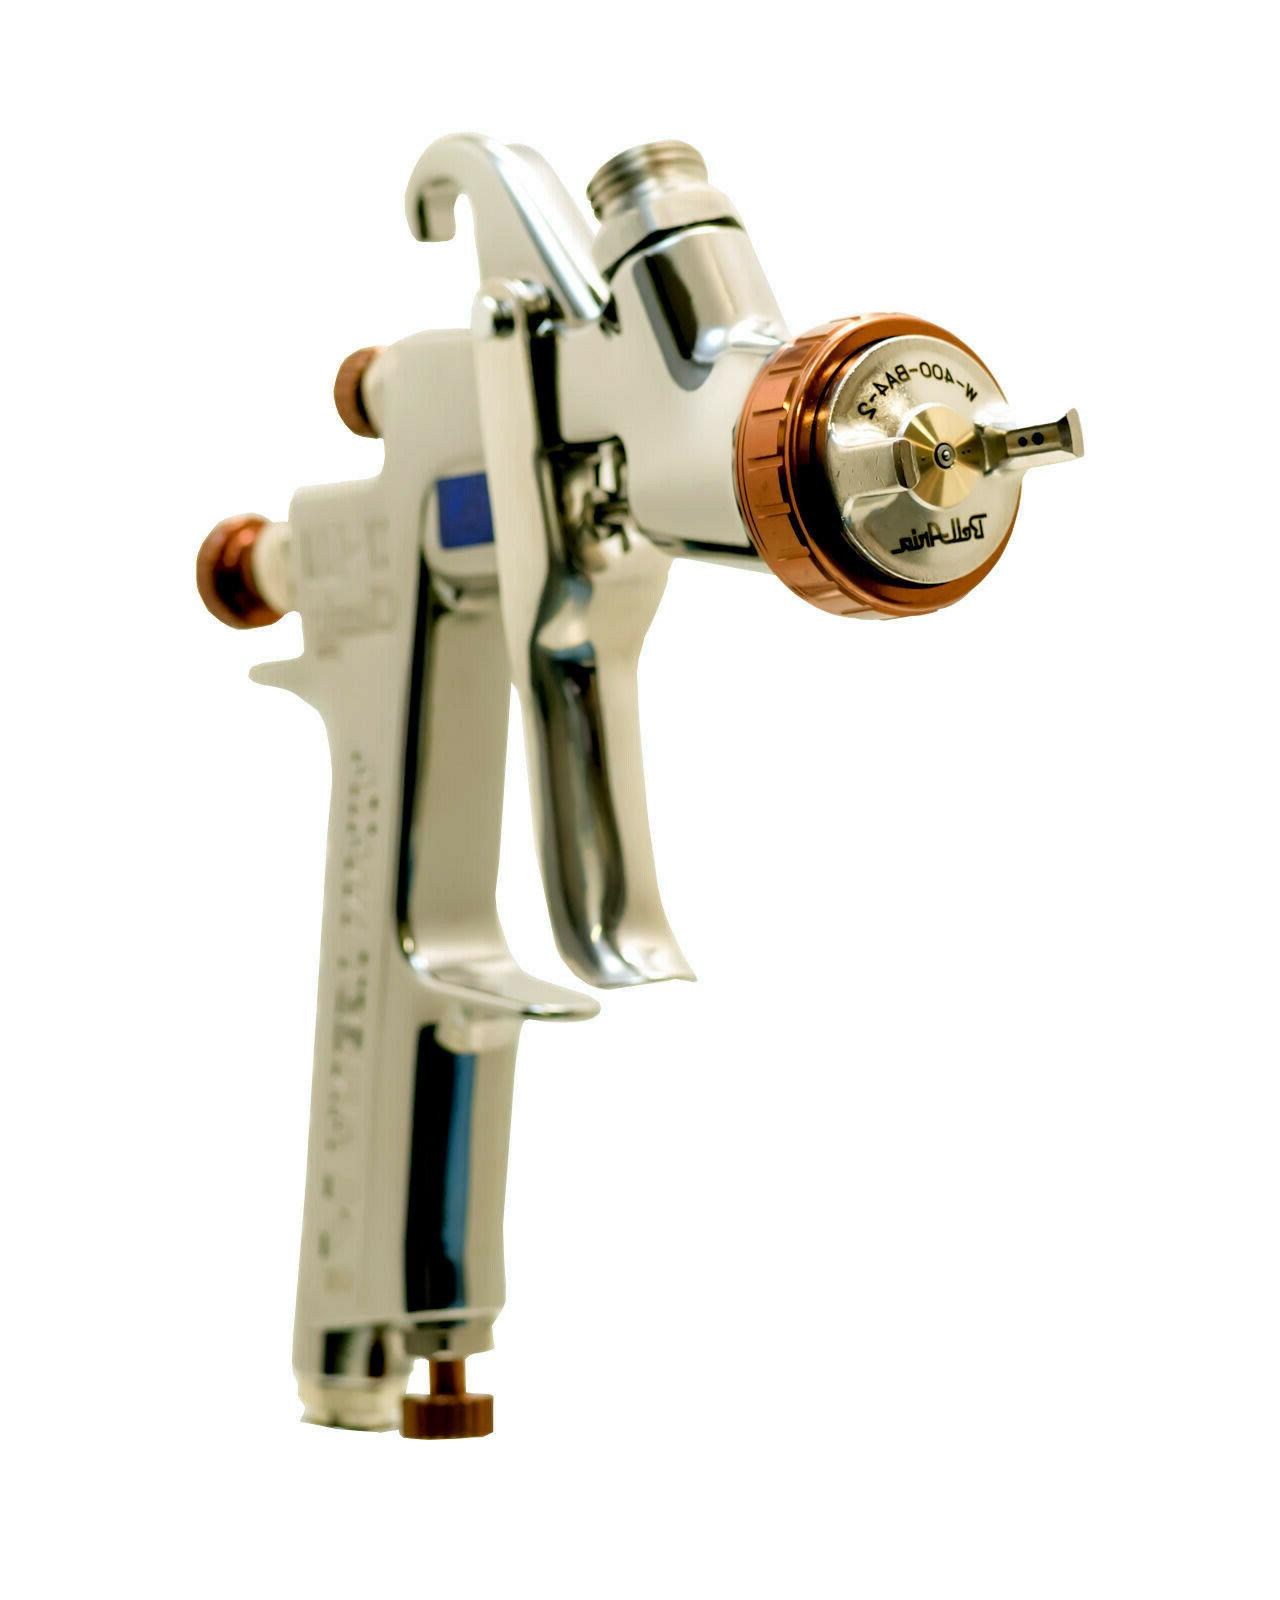 Anest 1.3mm Bellaria Spray Cup W400 plus